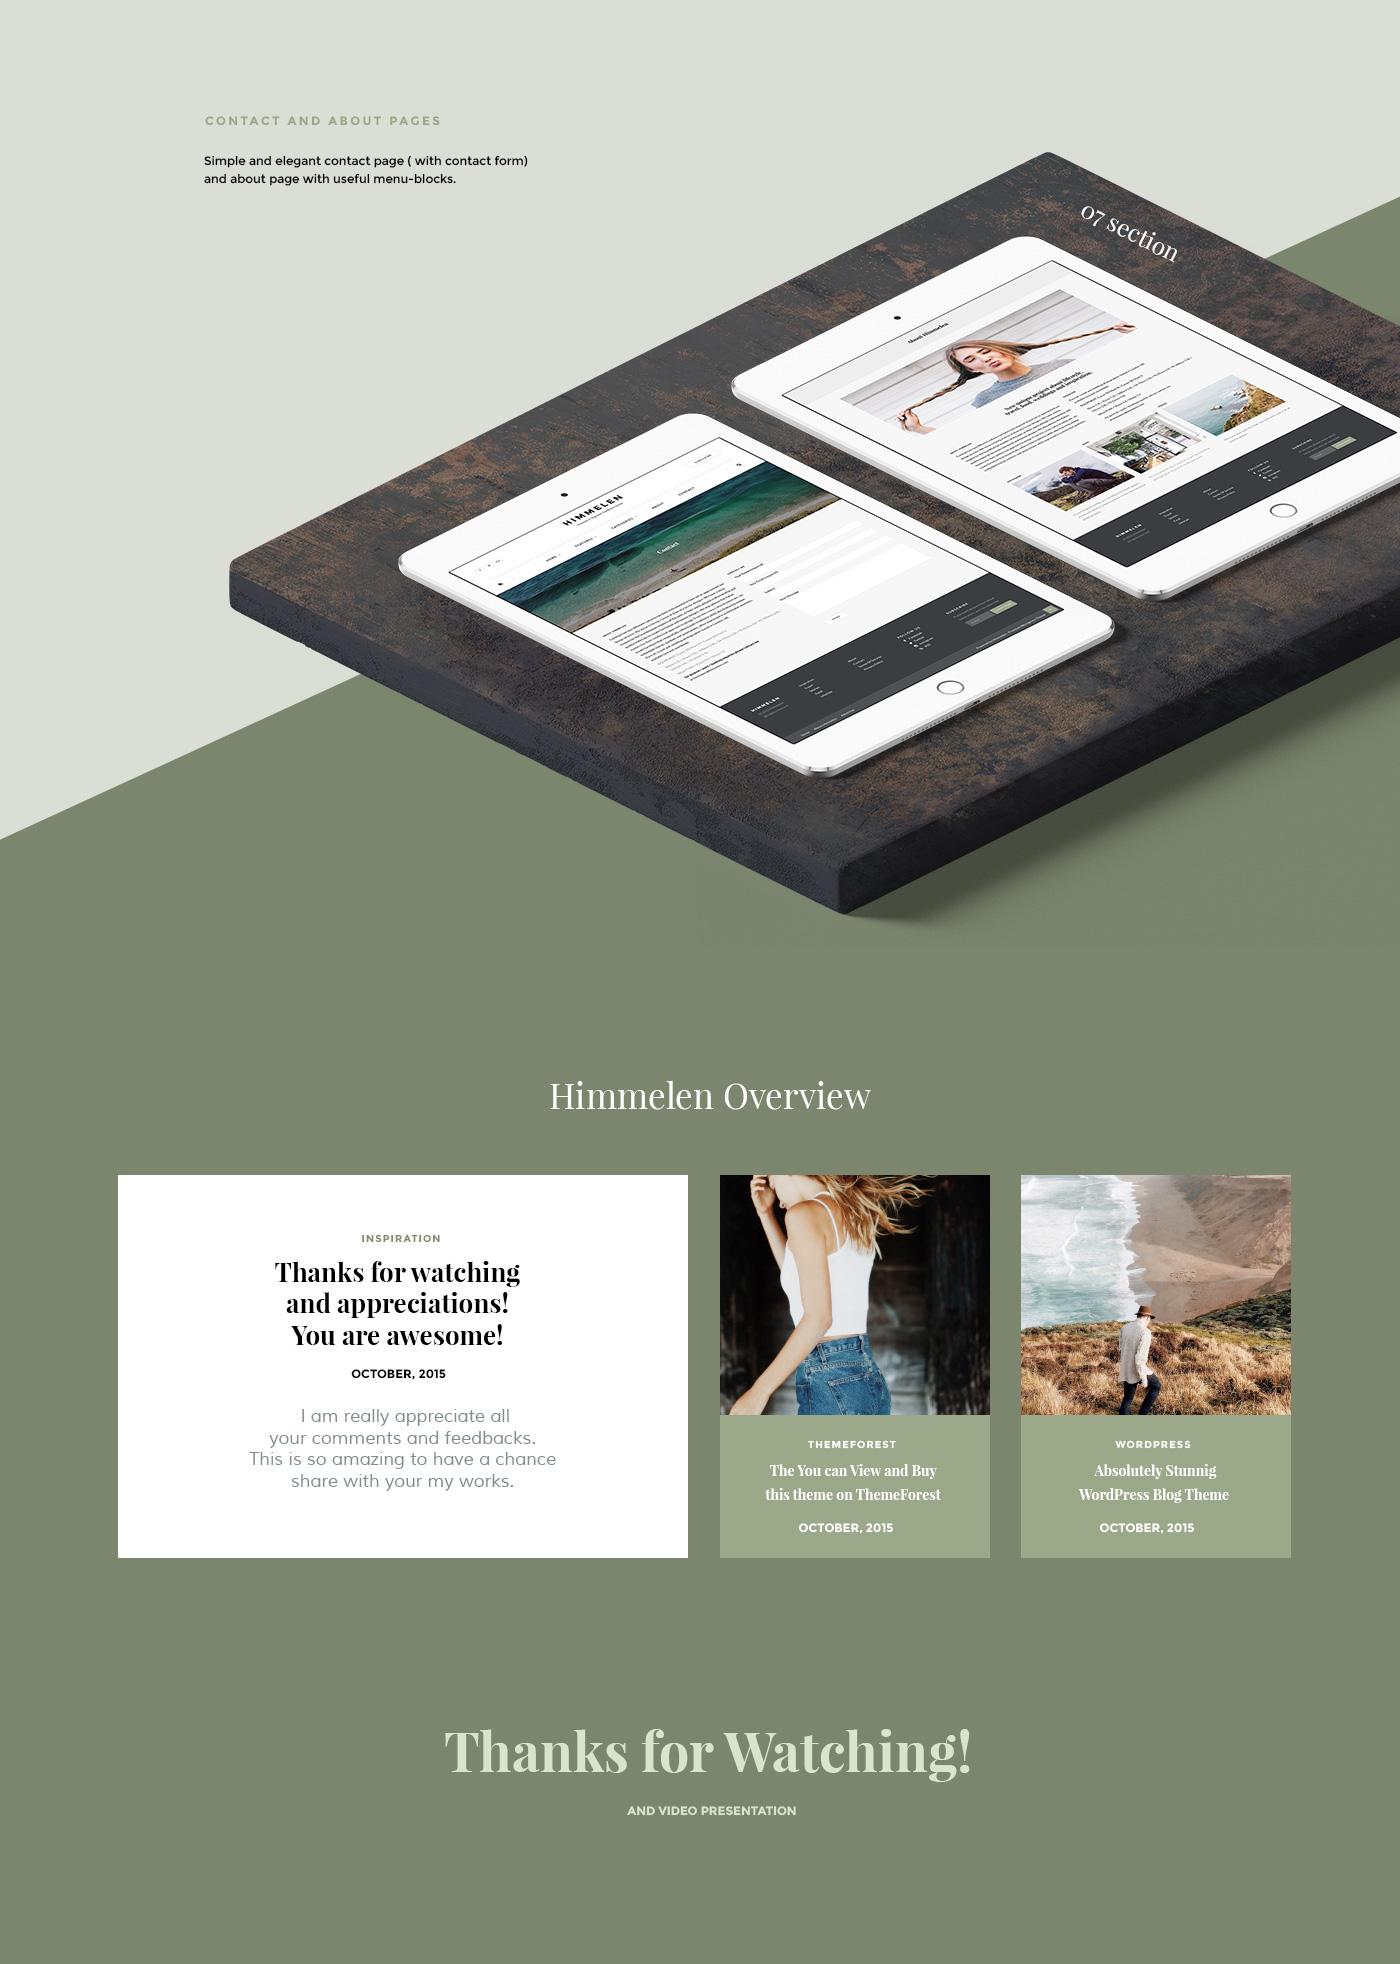 Web design themeforest Blog wordpress mimimal magazine Travel